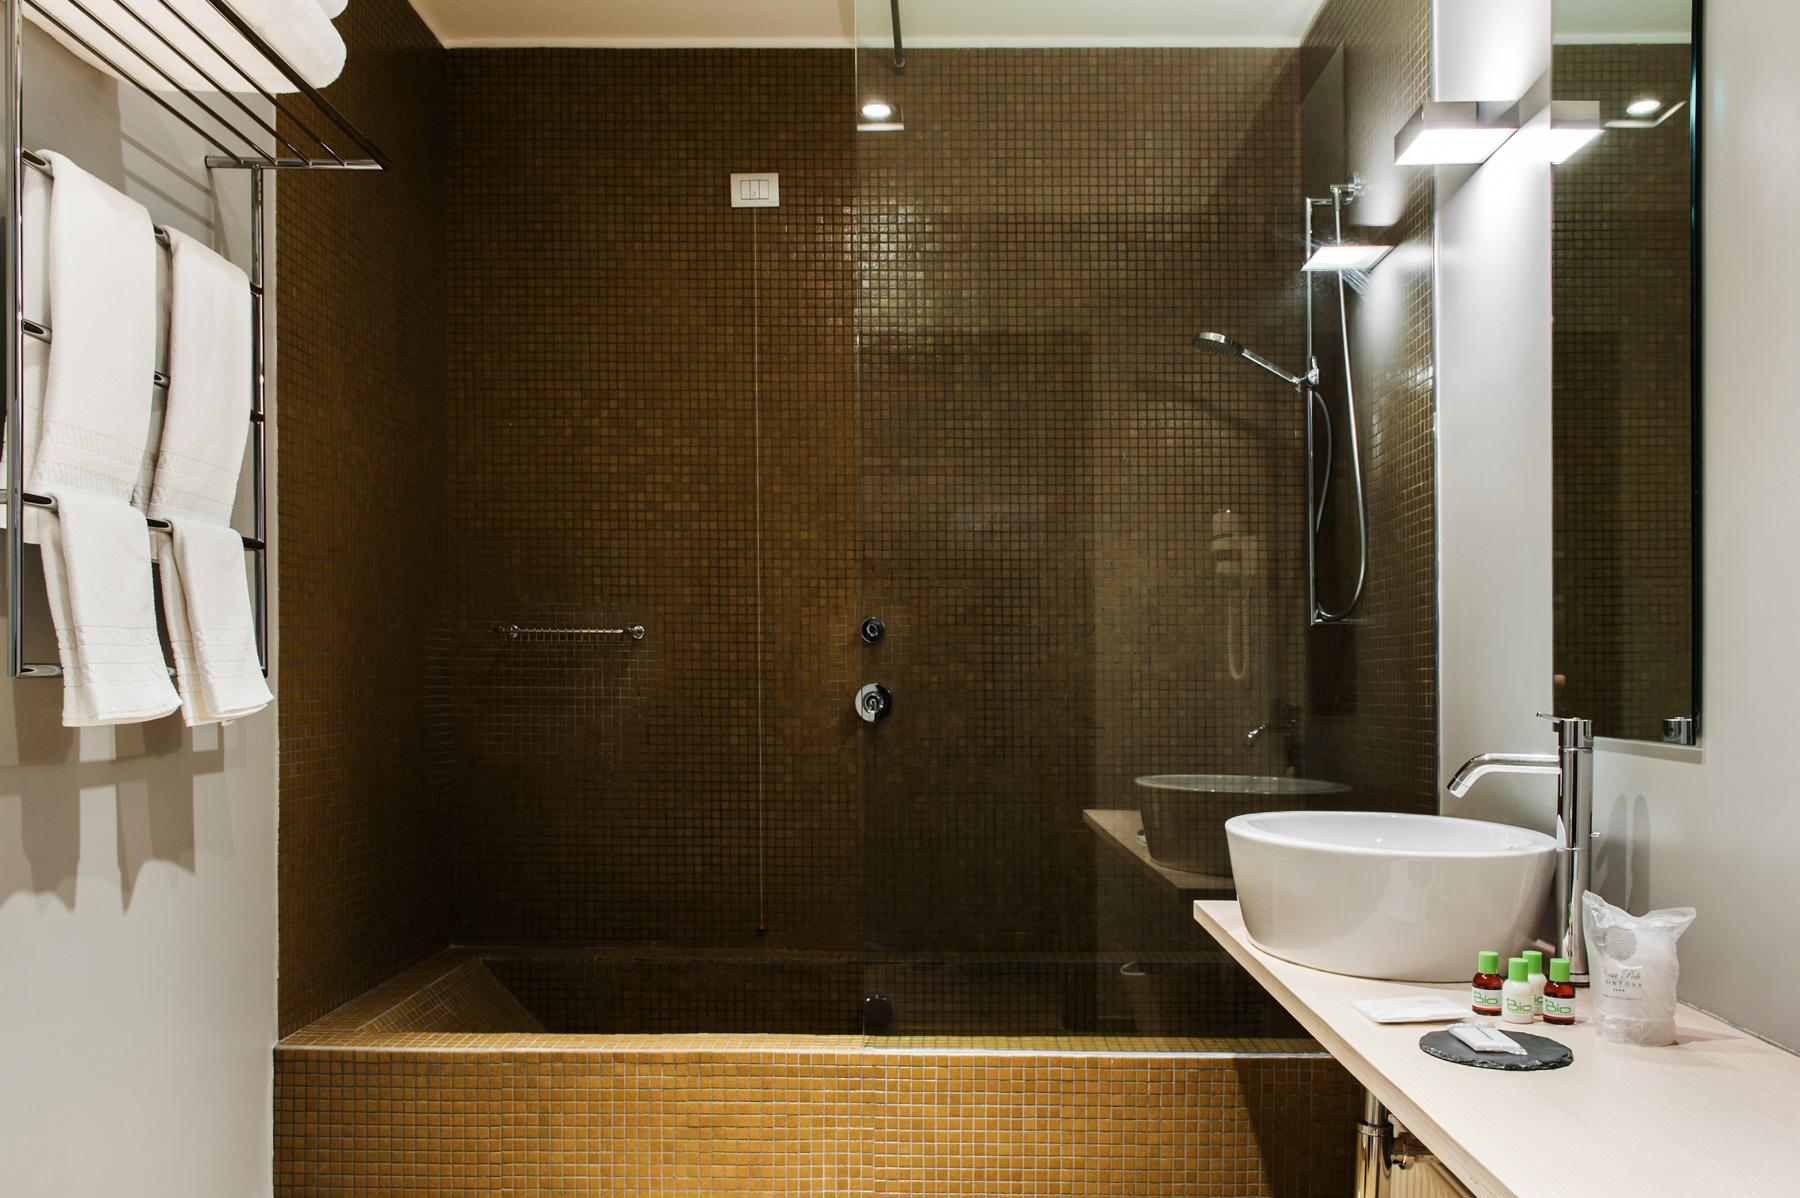 camera 320 vasca da bagno